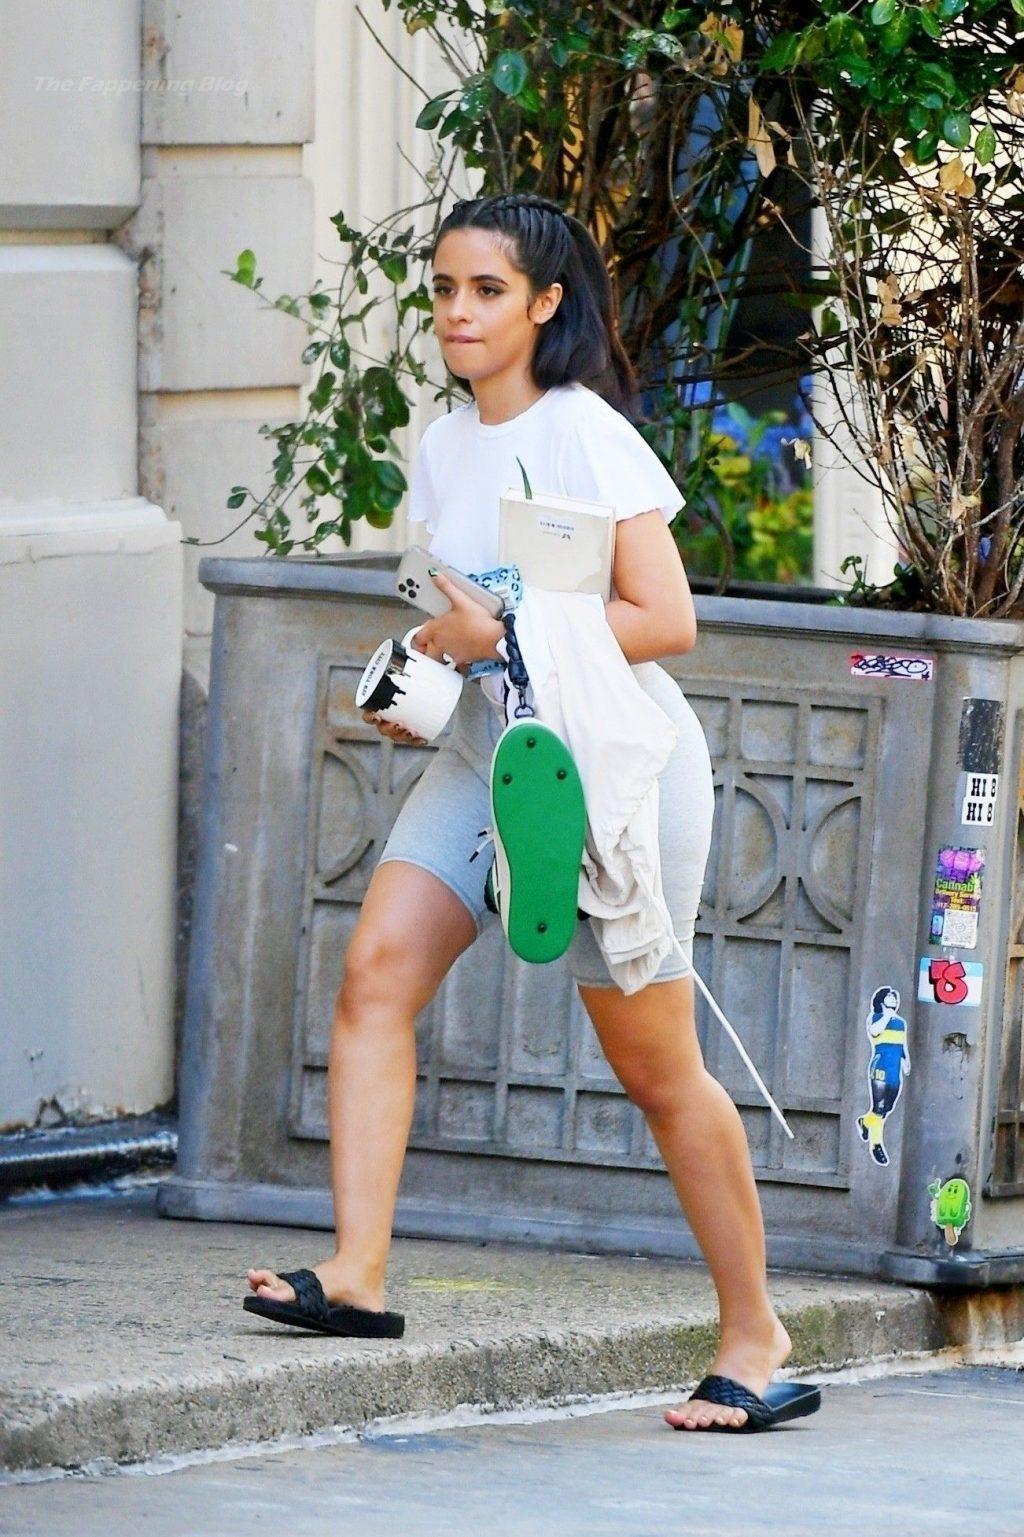 Leggy Camila Cabello Steps Out Carrying a Cool NIKE Shoe Handbag (11 Photos)